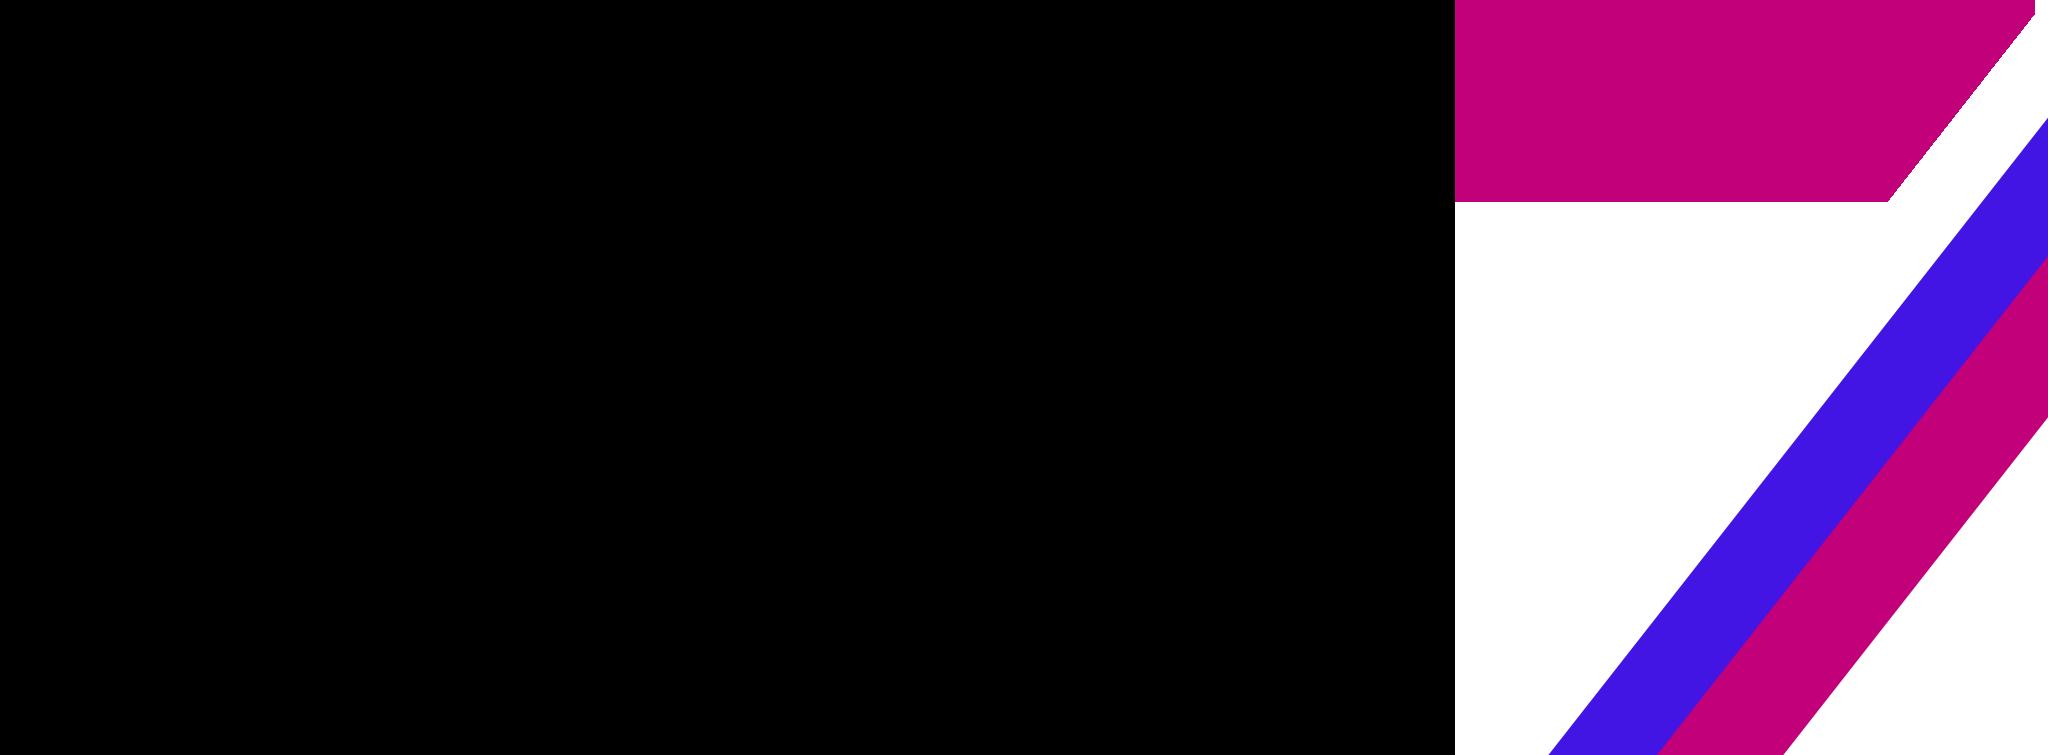 donfascelateralidestra